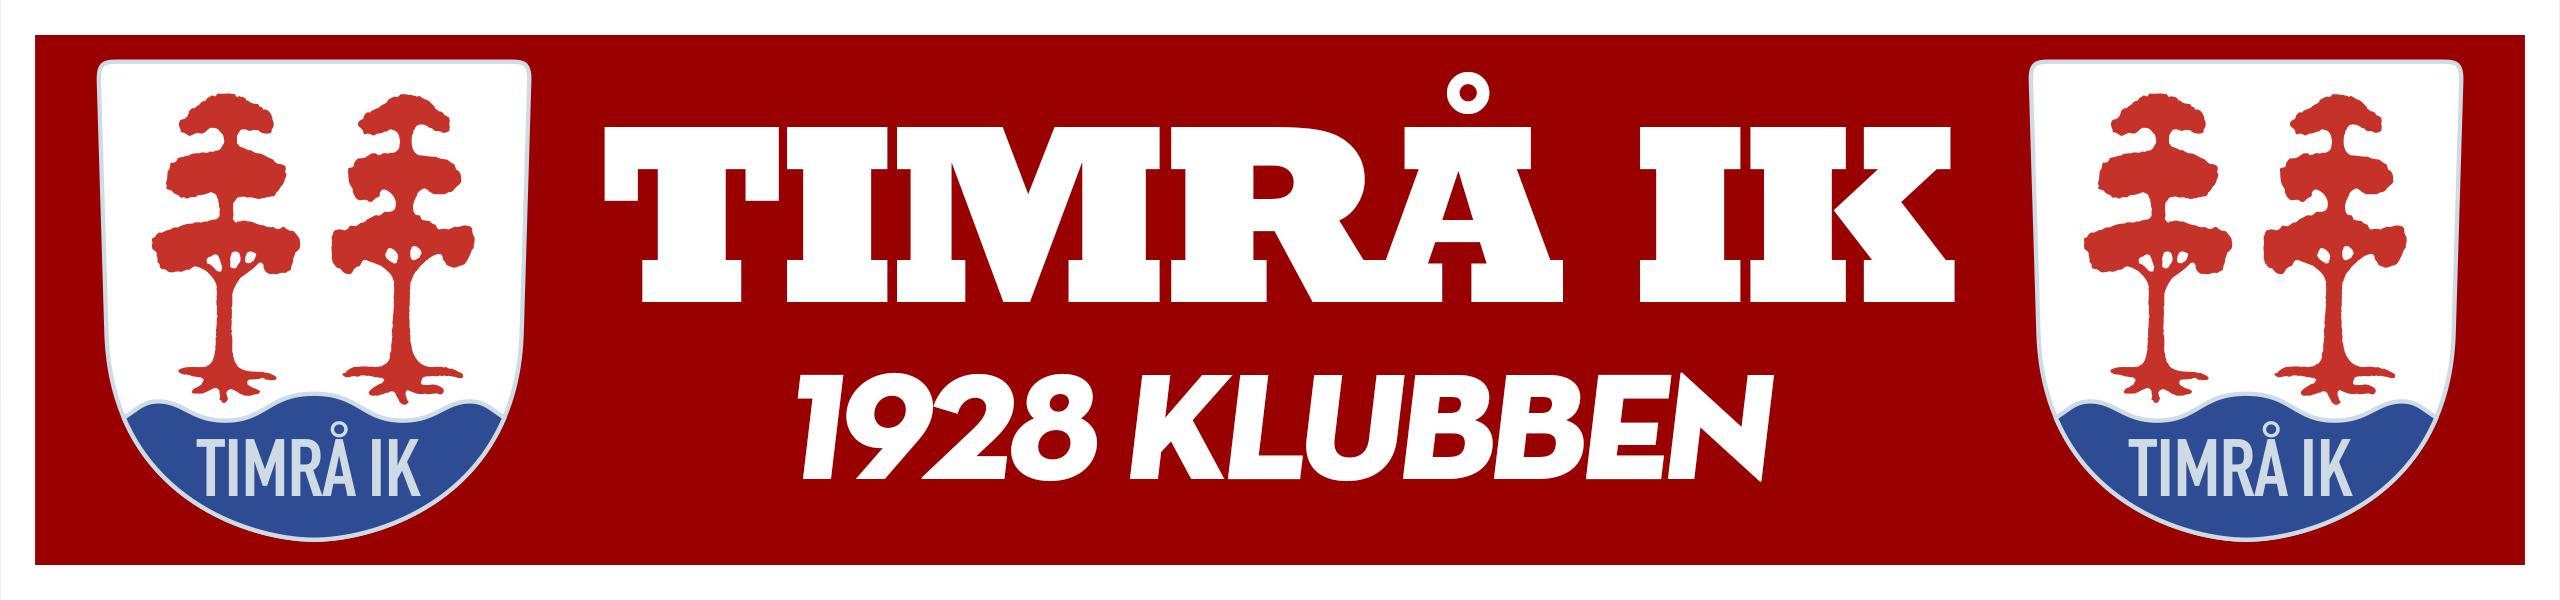 1928-banner